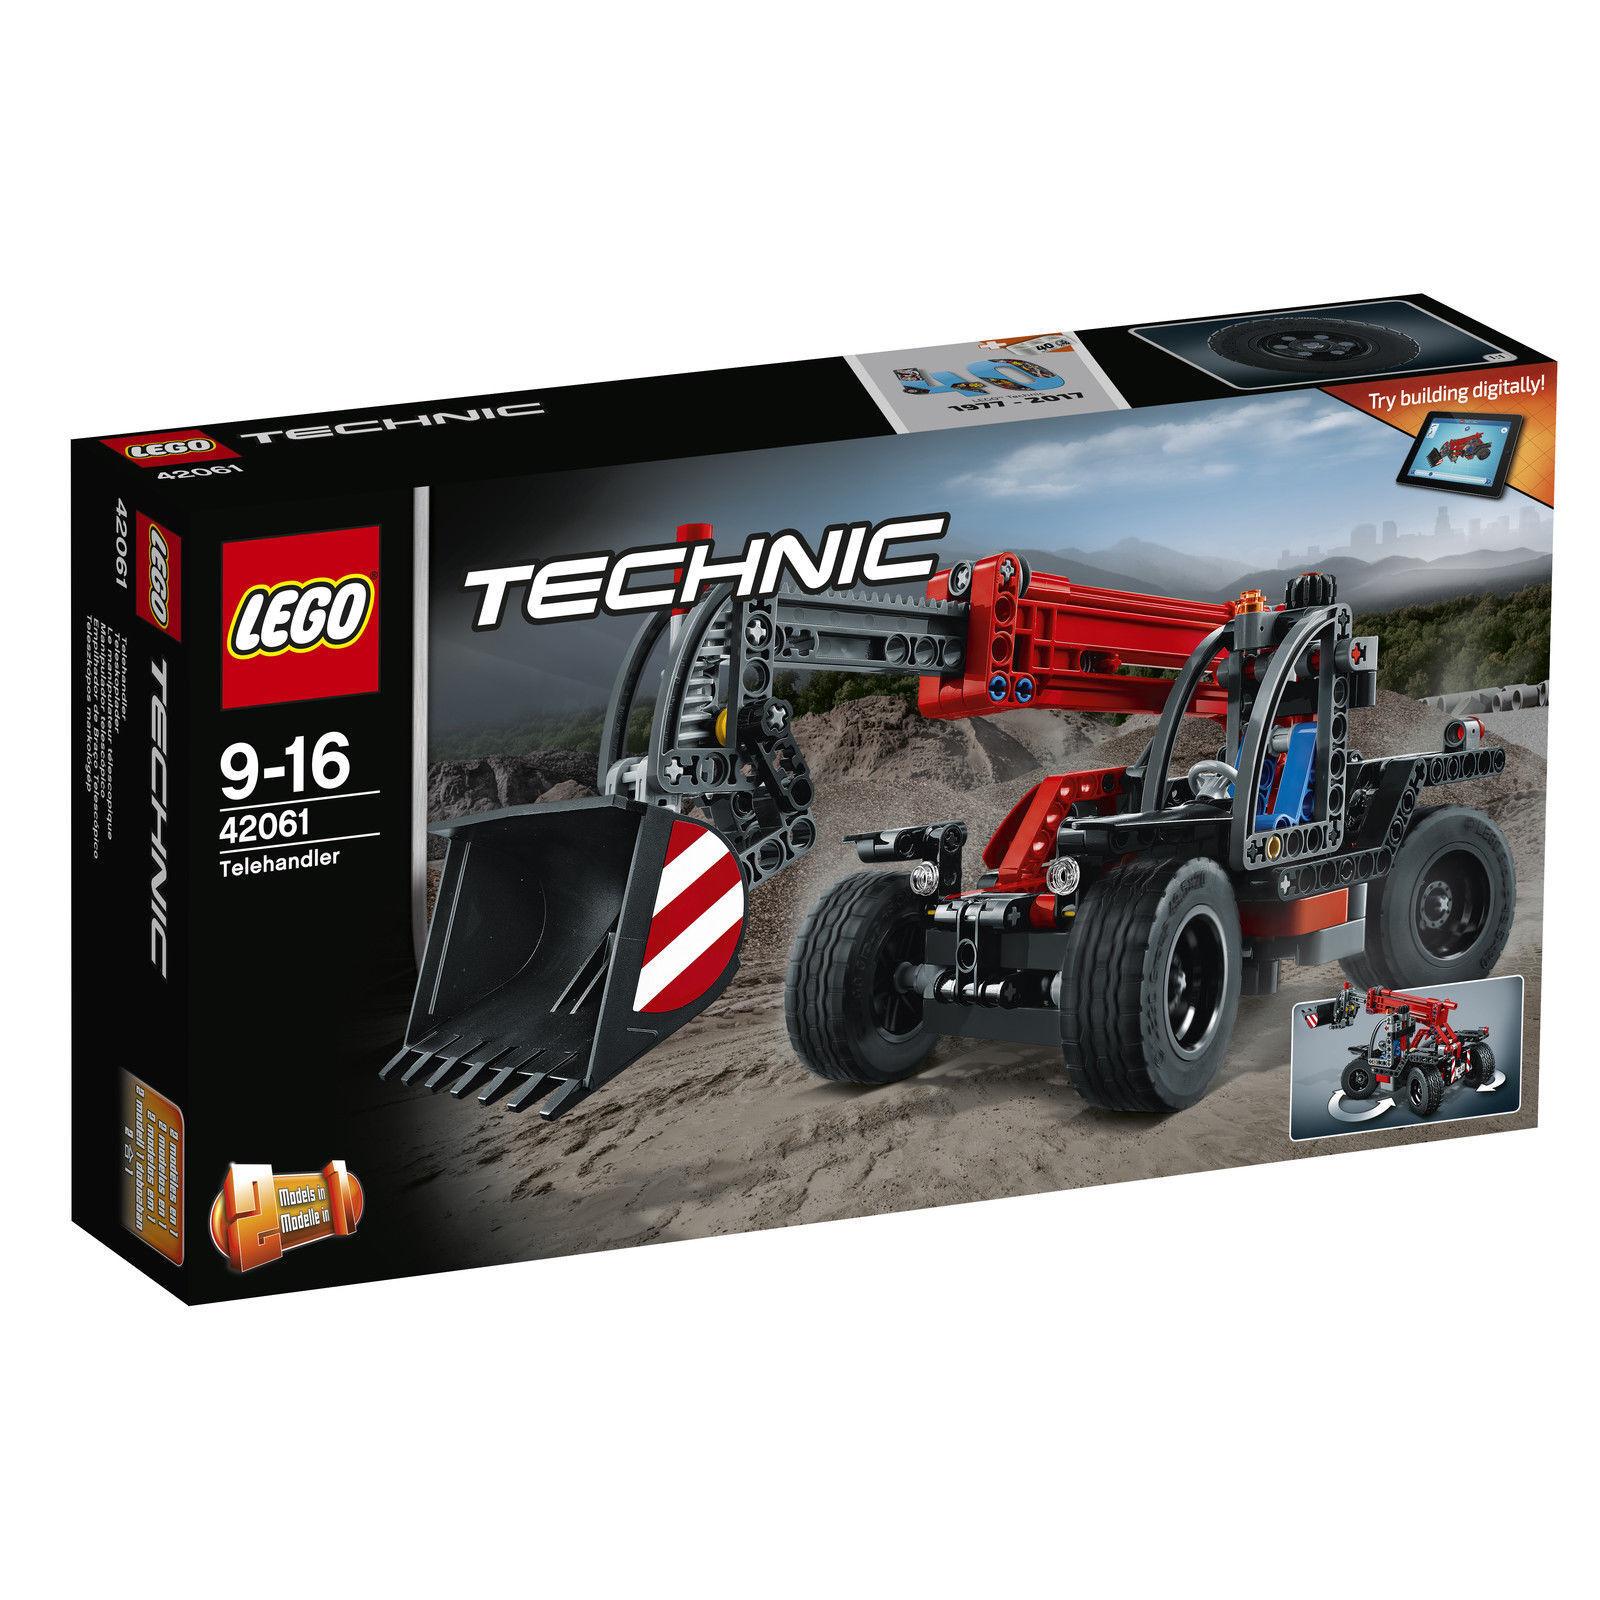 LEGO Technic Teleskoplader 42061 NEU OVP